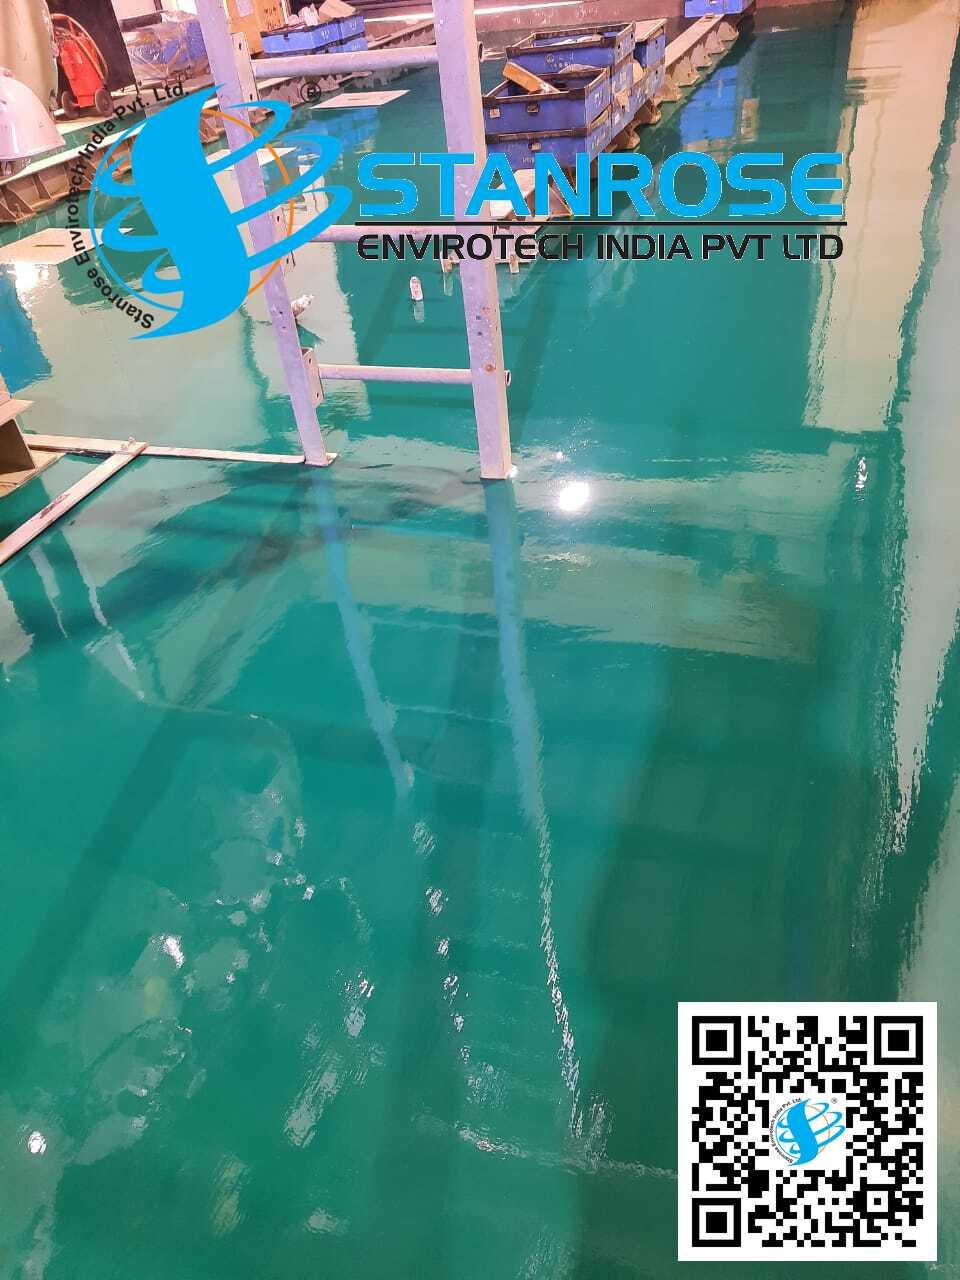 Stanrose in India is leading supplier of High Voltage Dielectric Insulation Epoxy Flooring material and service provider in mumbai pune nashik nagpur chennai gujarat vapi vadodara surat silvassa indore hyderbad kochi bengaluru